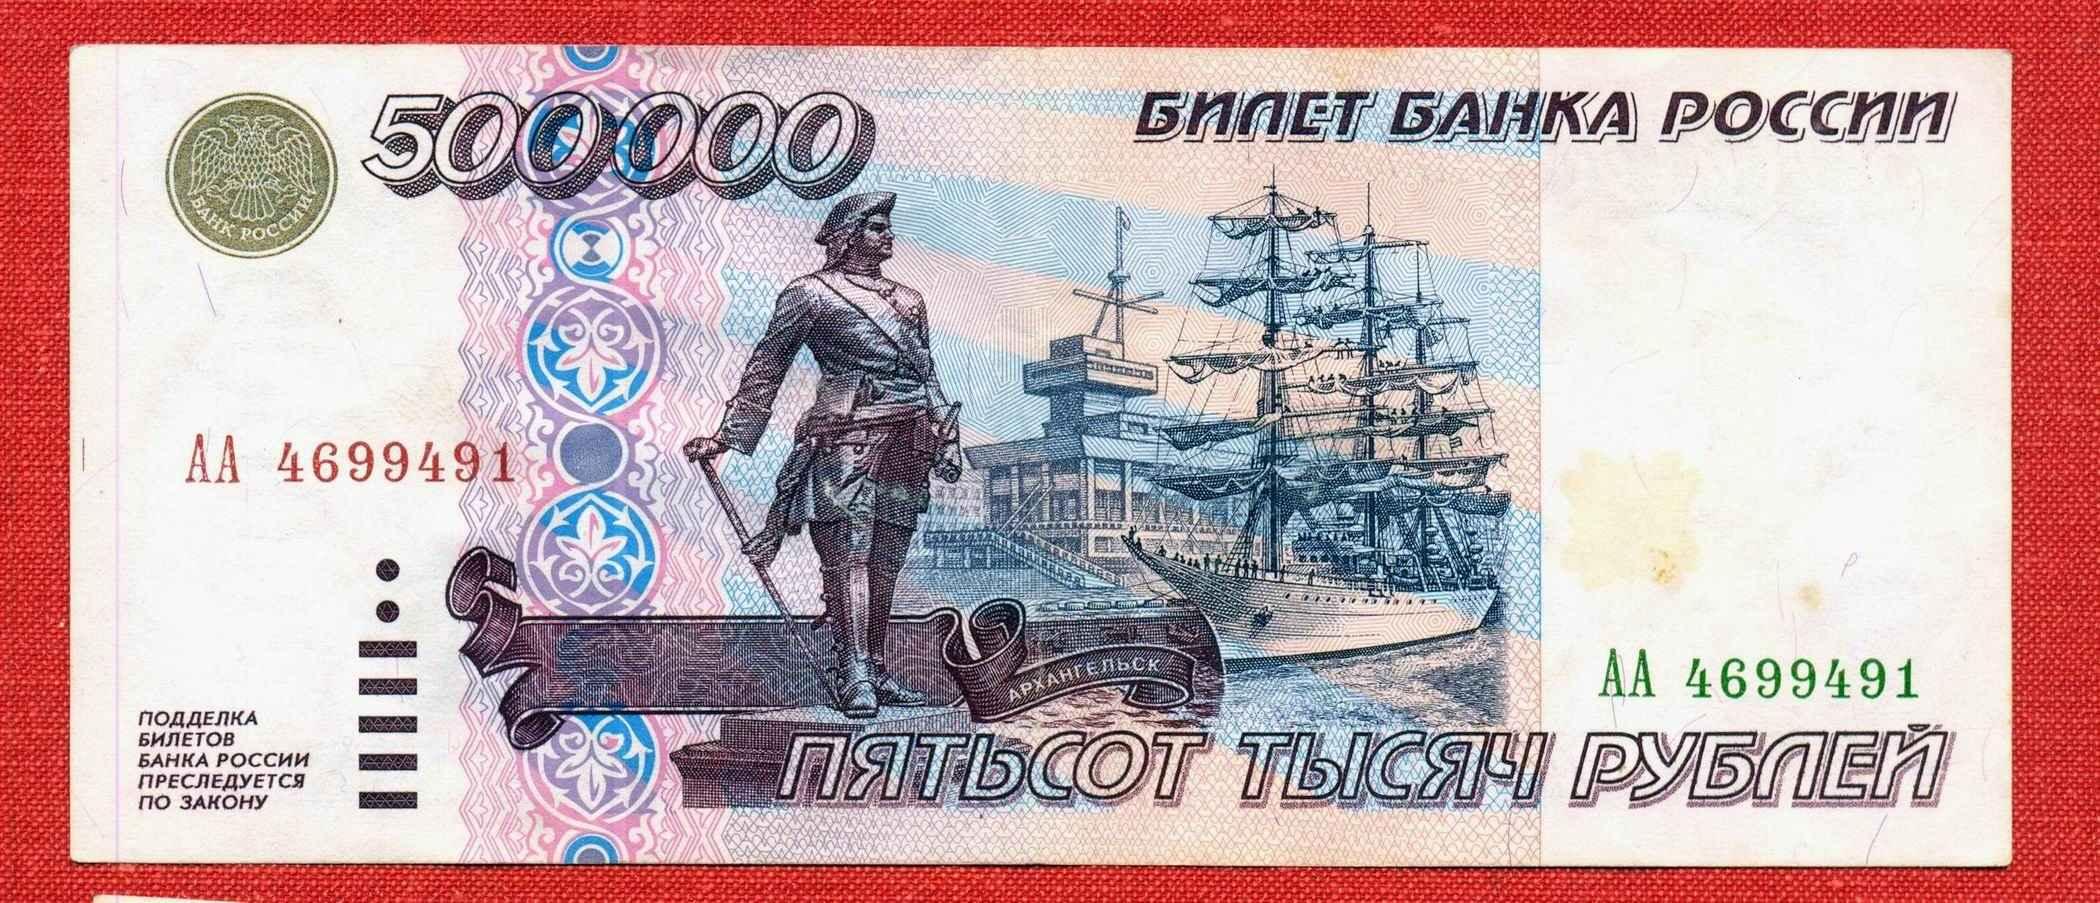 Шлюха в москве за 1000 рублей